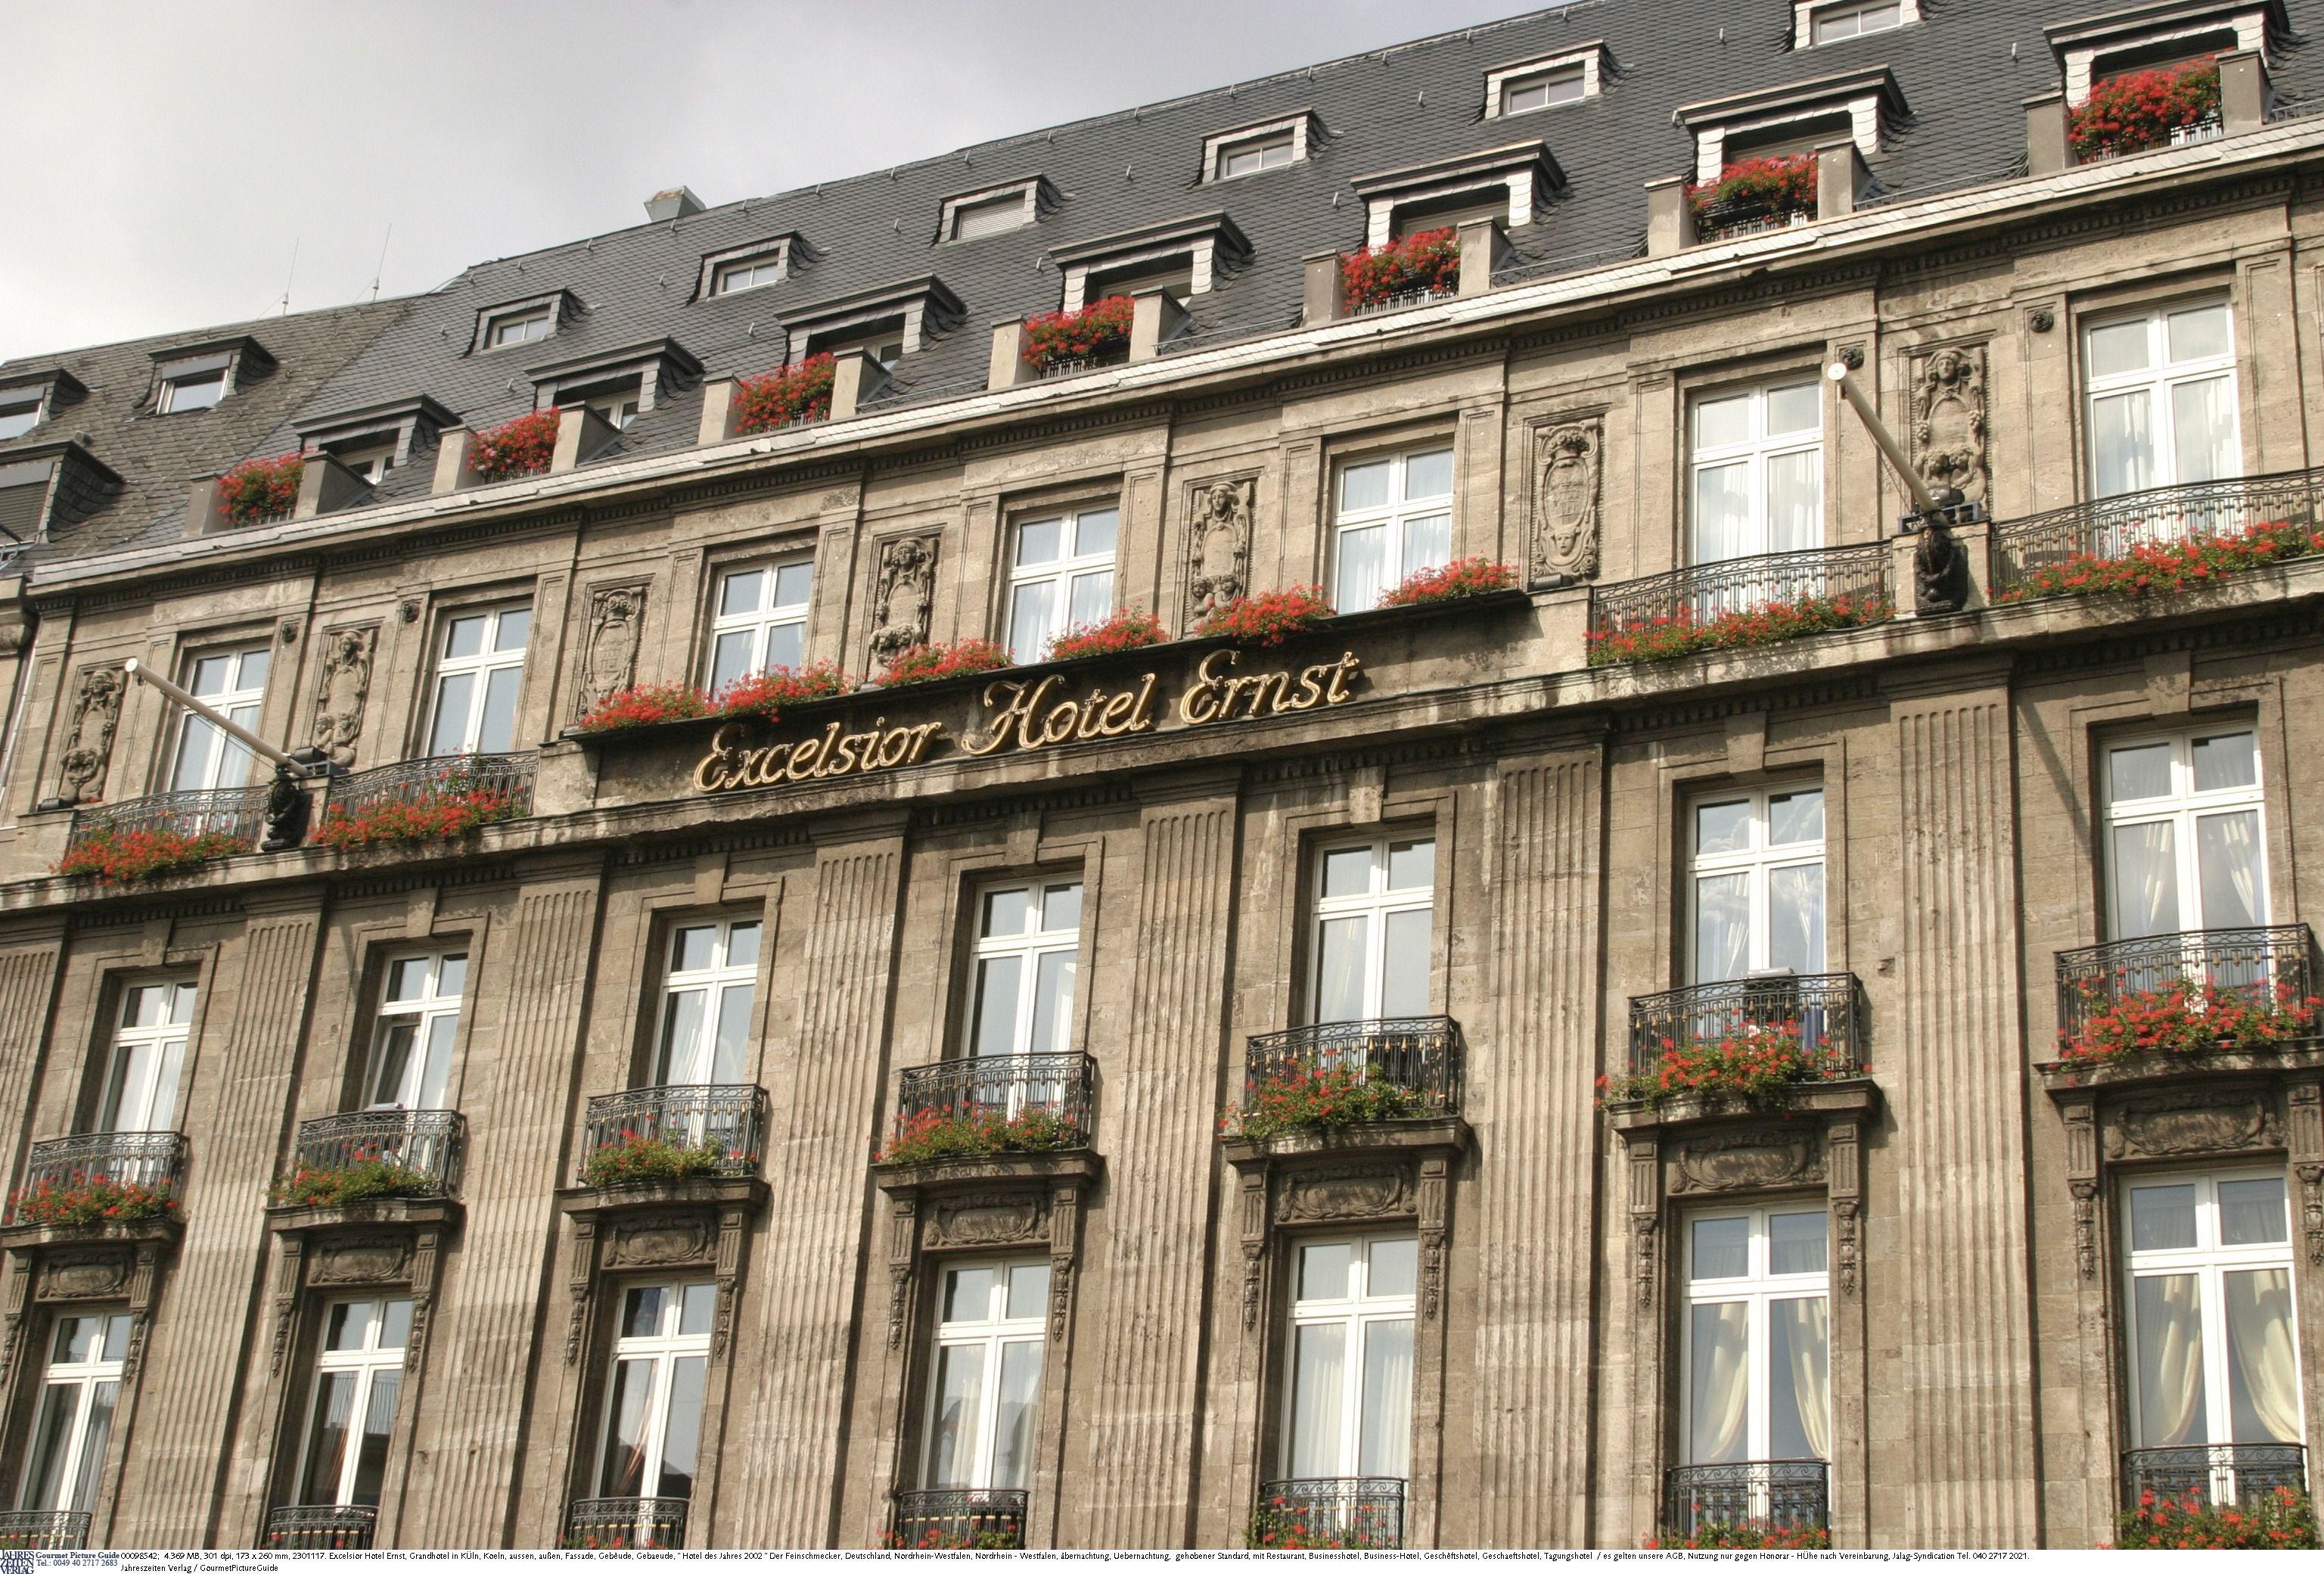 Excelsior Hotel Ernst Köln Köln